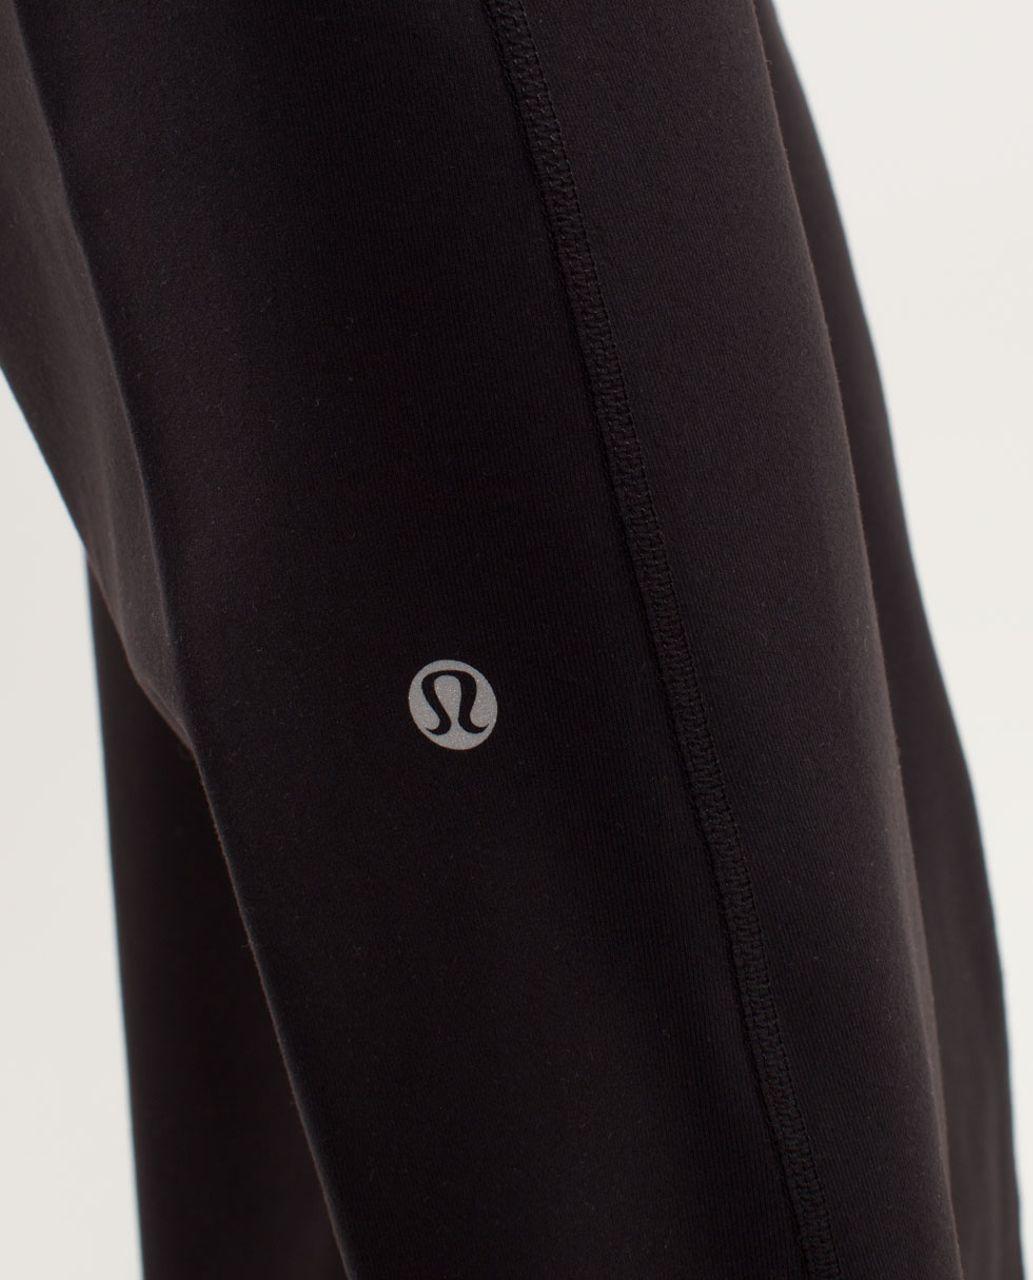 Lululemon Groove Pant (Regular) - Black /  Quilting Spring 10